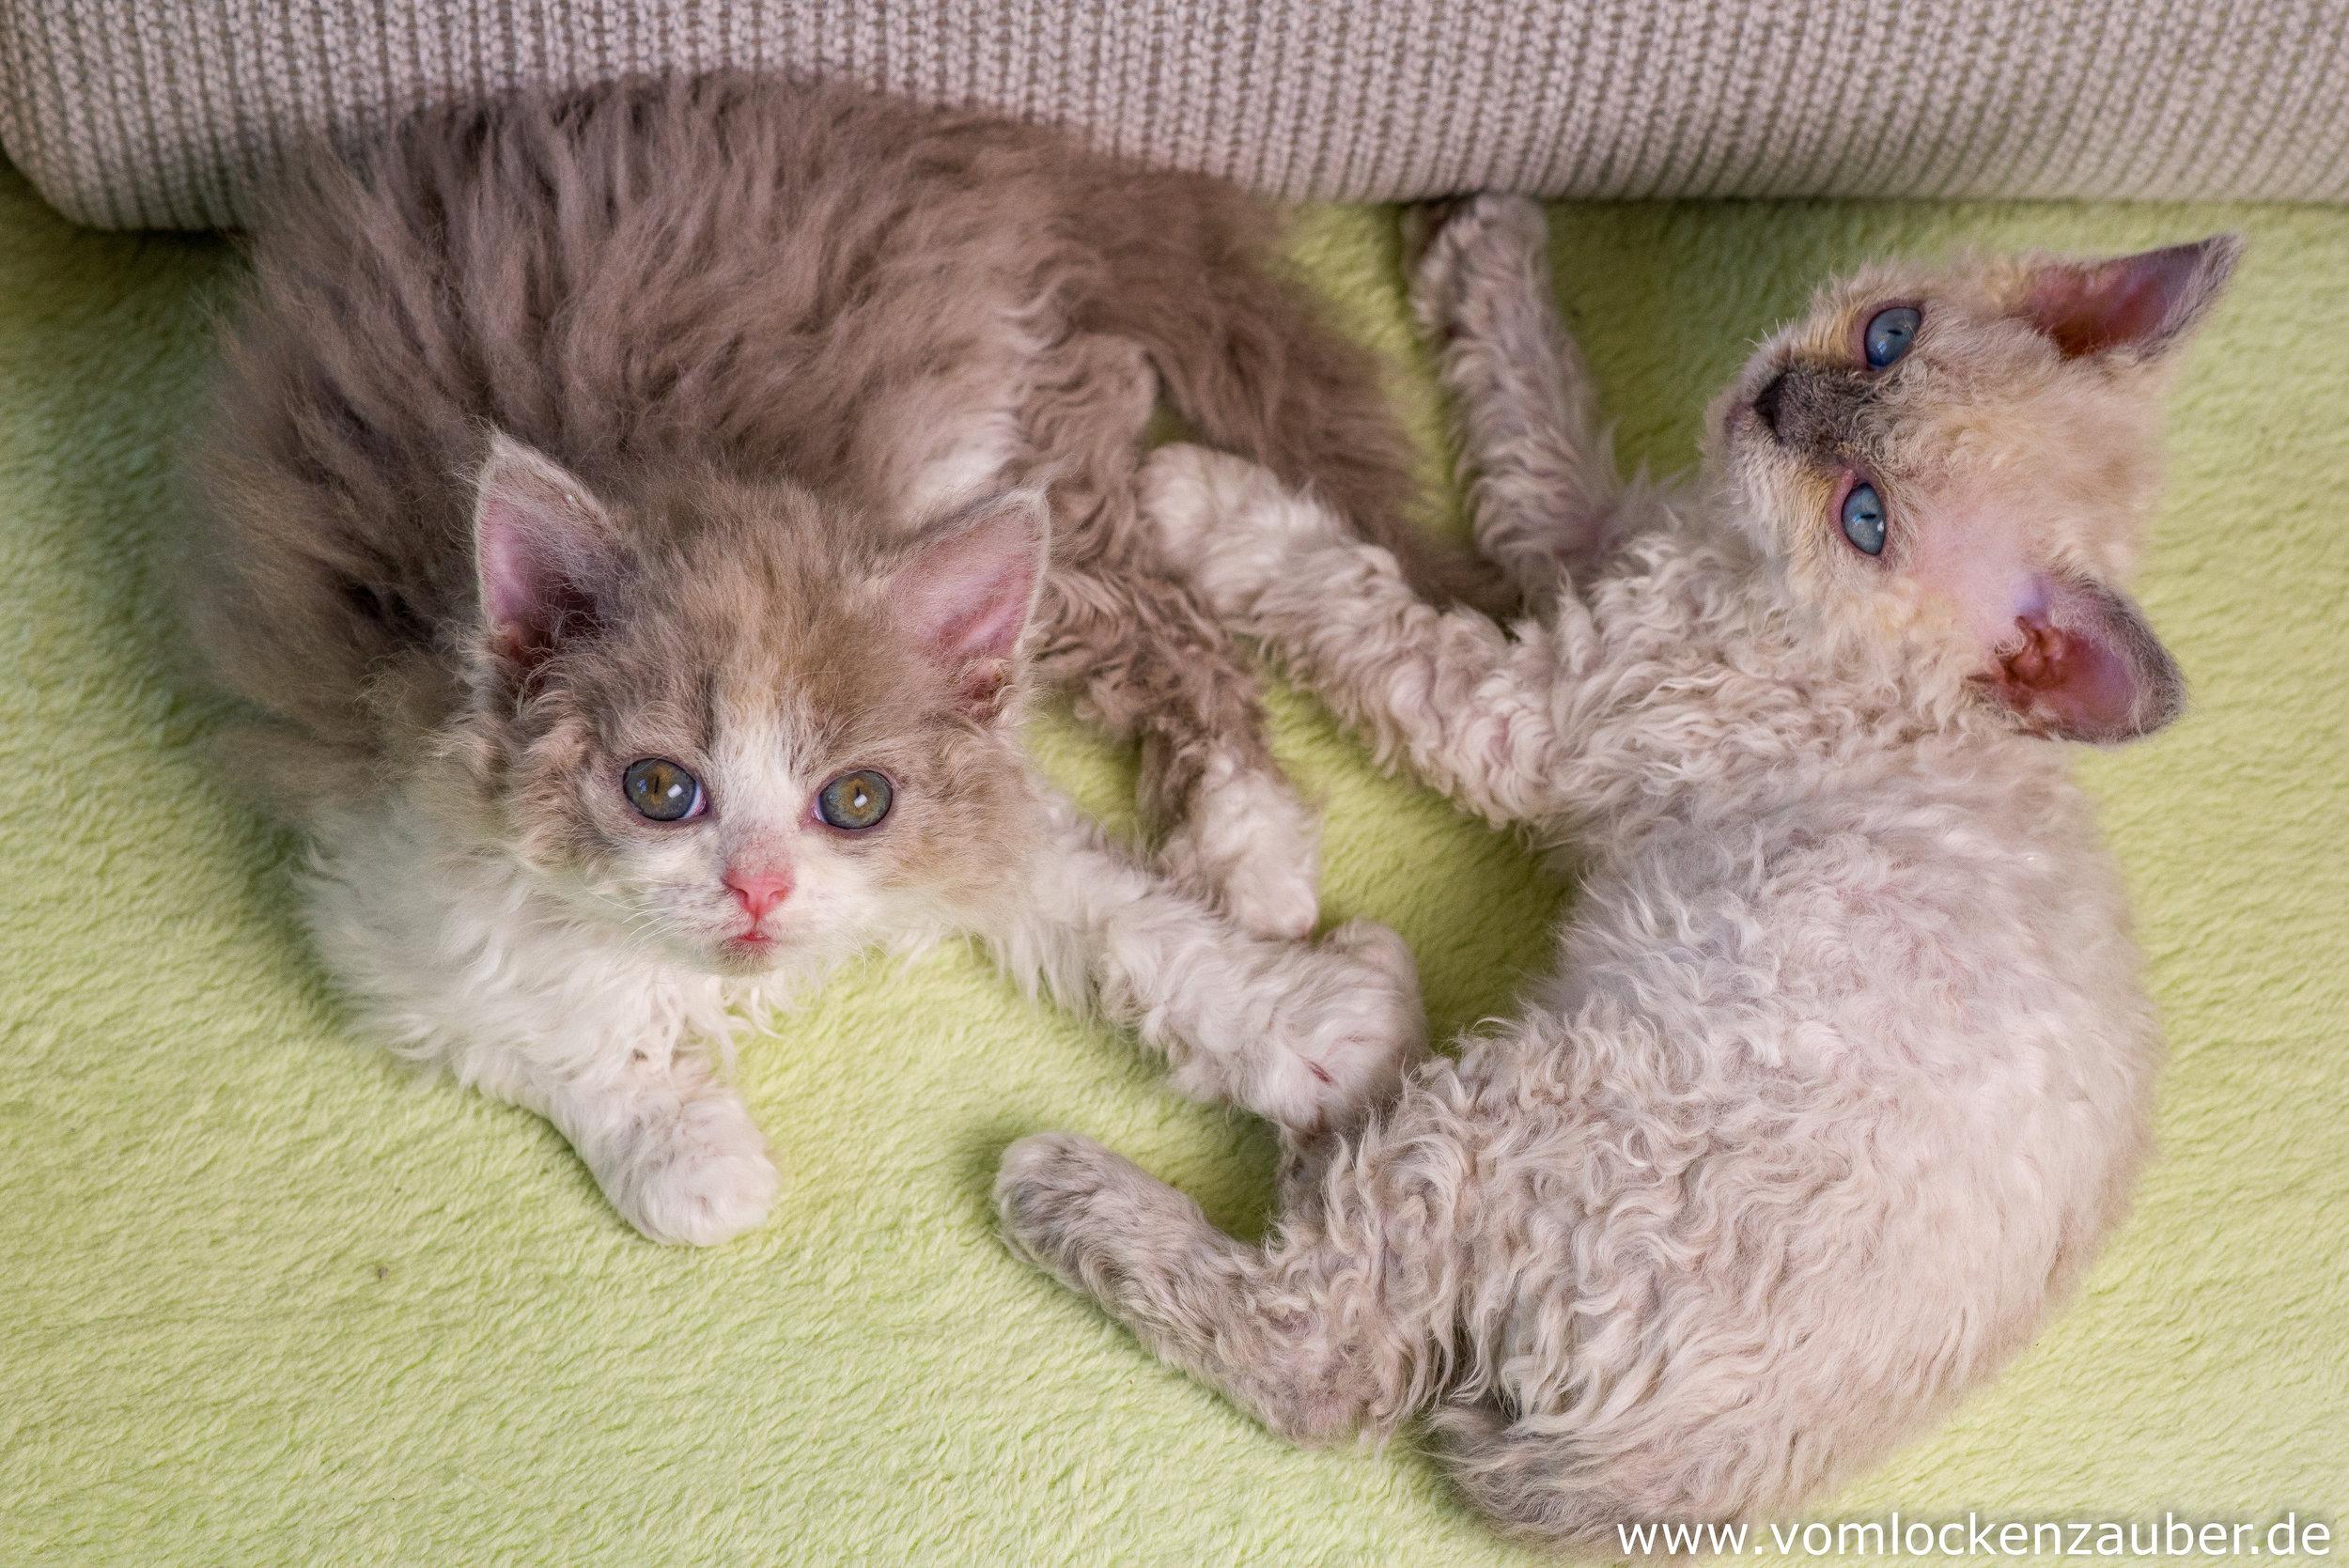 Estella Snoopy und Eddy